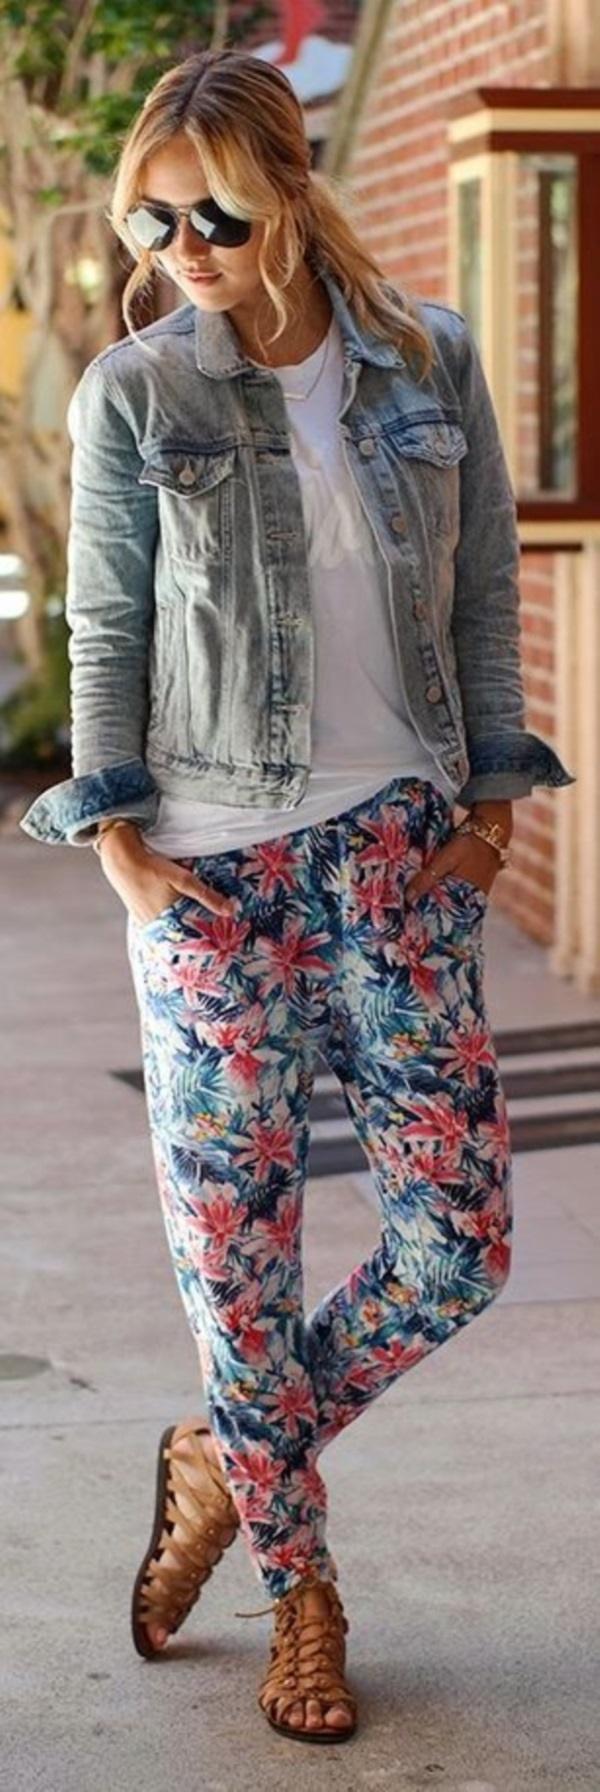 black floral pants outfits (39)